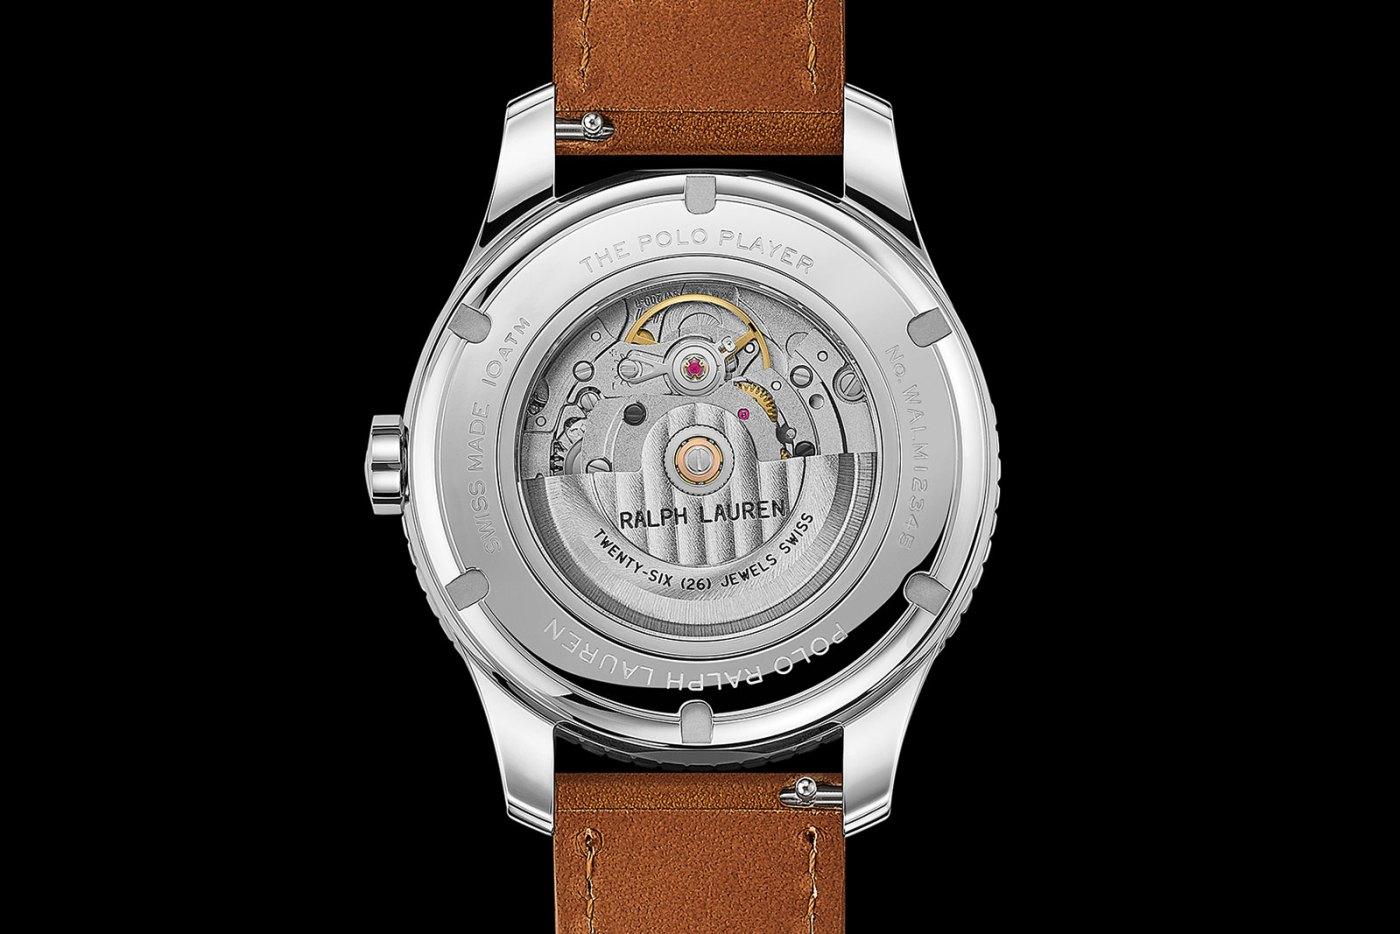 The Polo Watch 2020 caseback